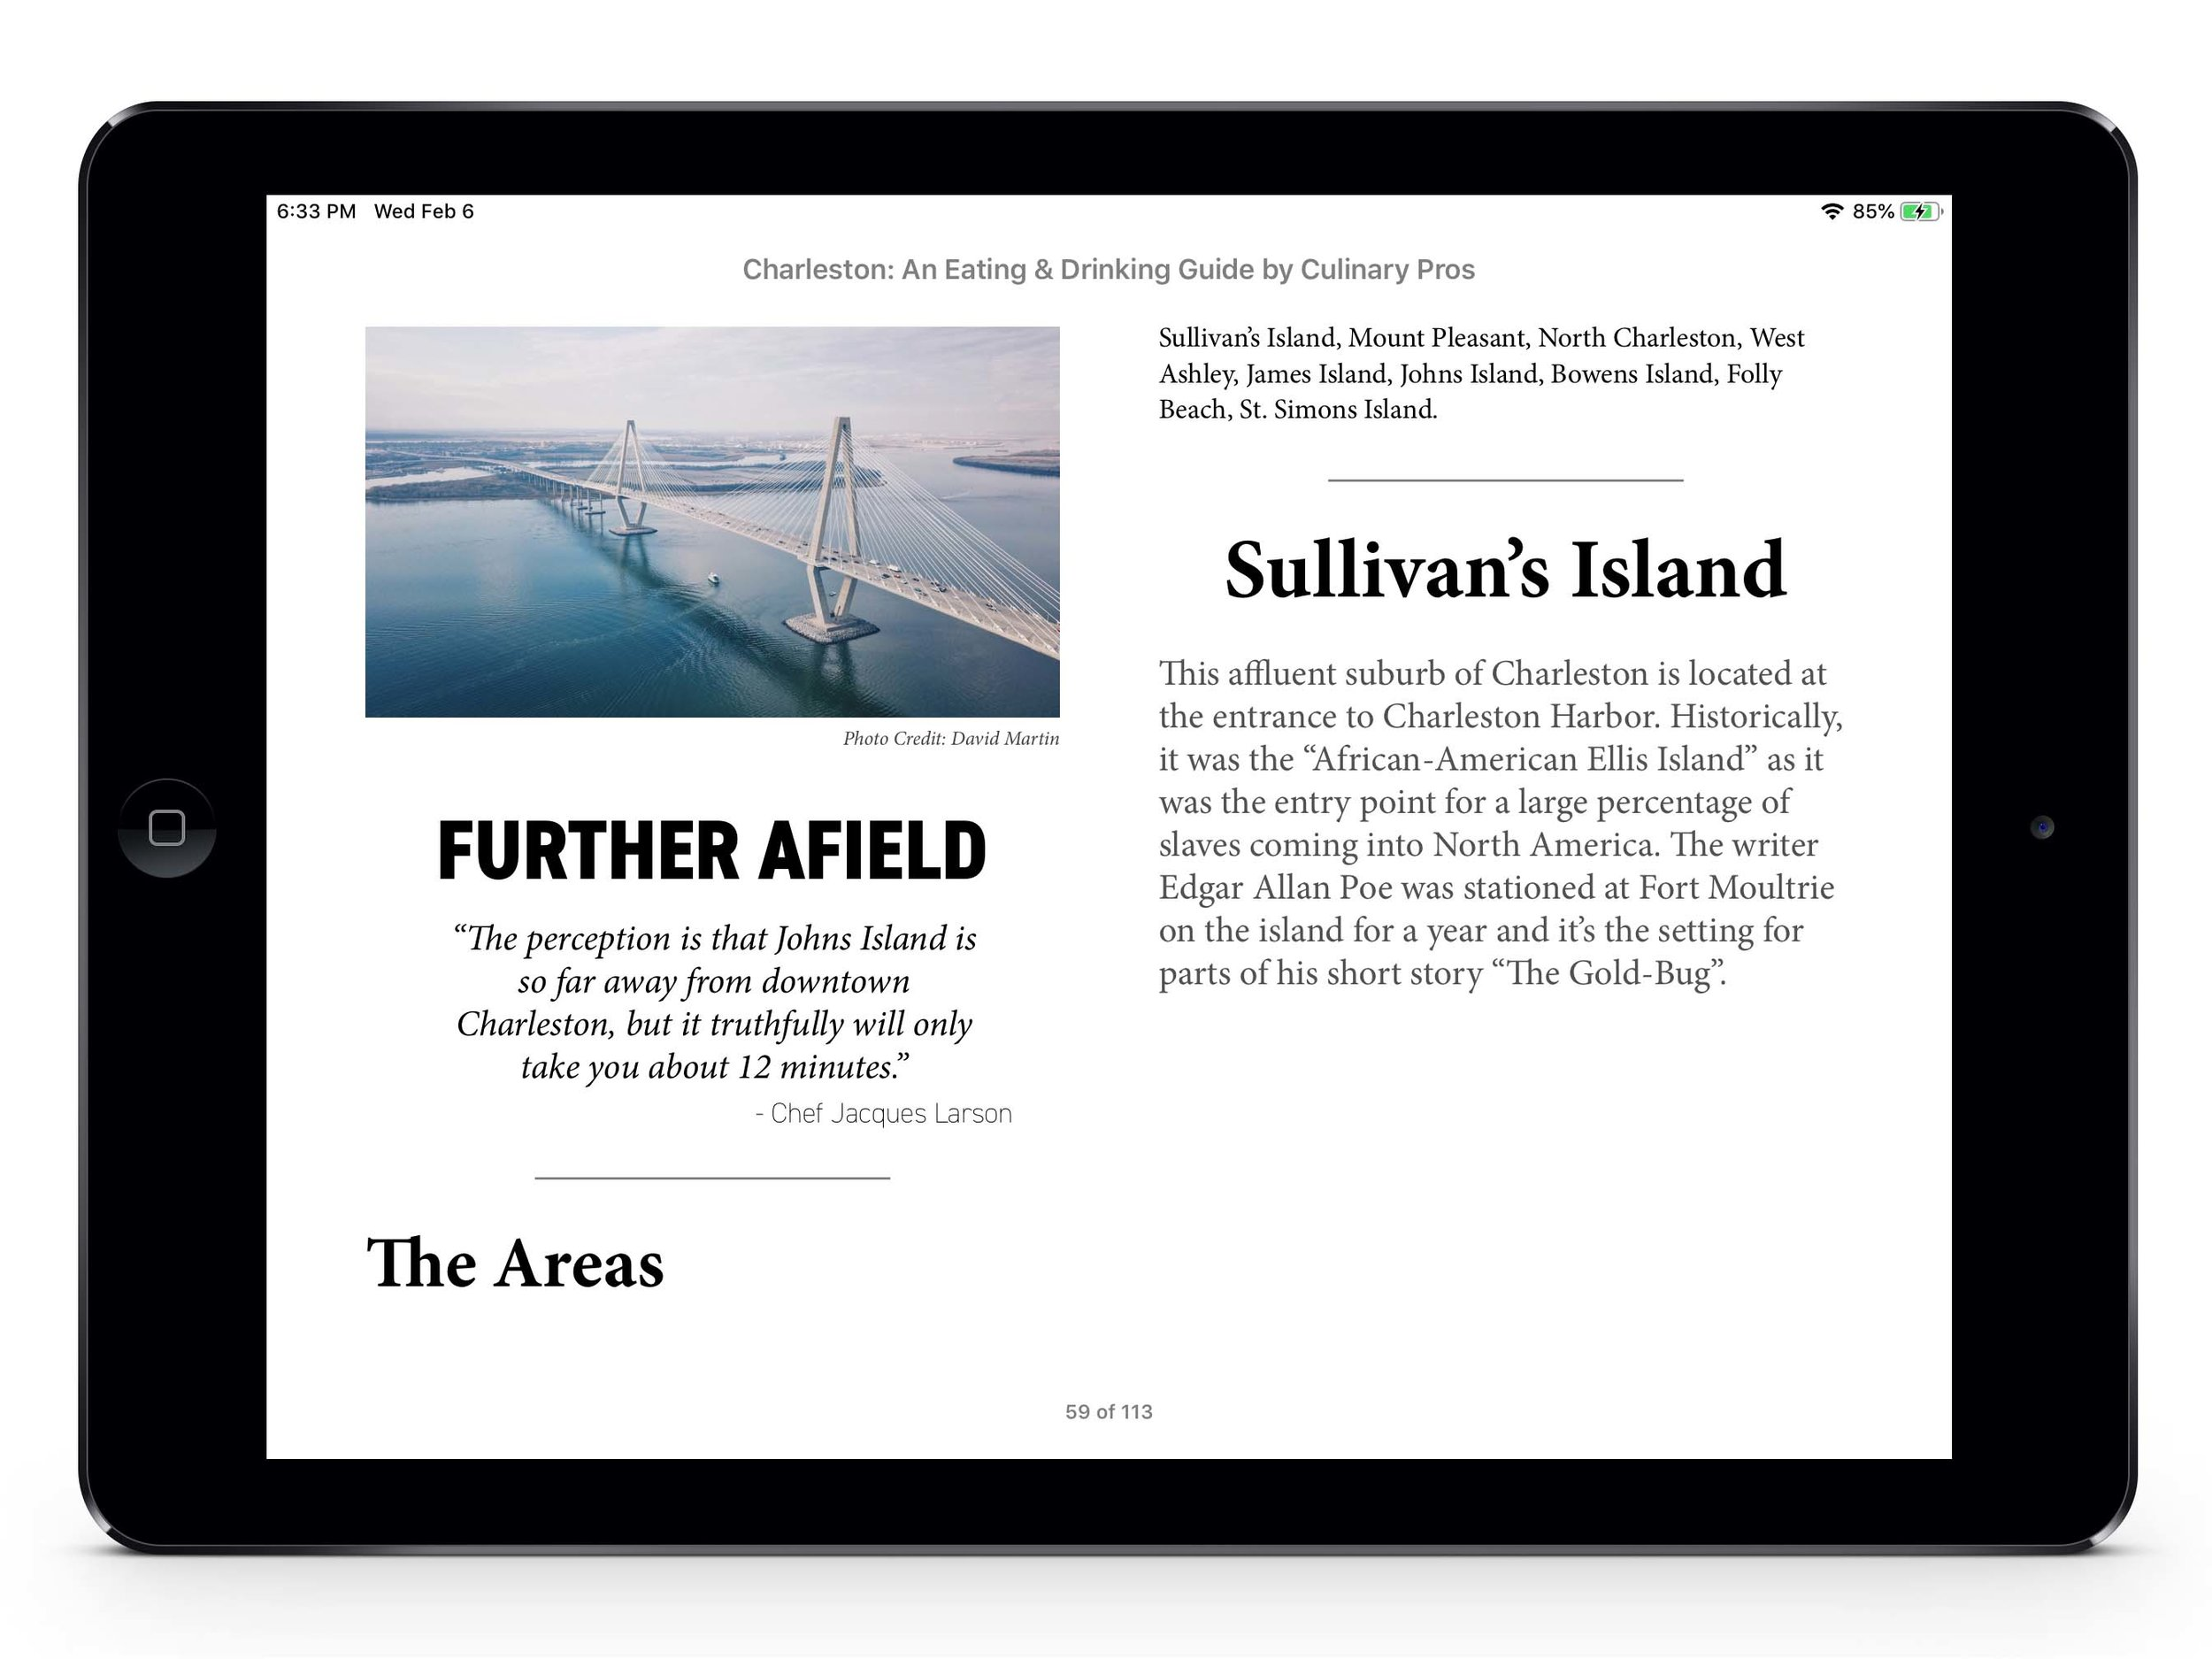 iPadAir_Charleston_Screenshots_Landscape_1.11_med.jpg